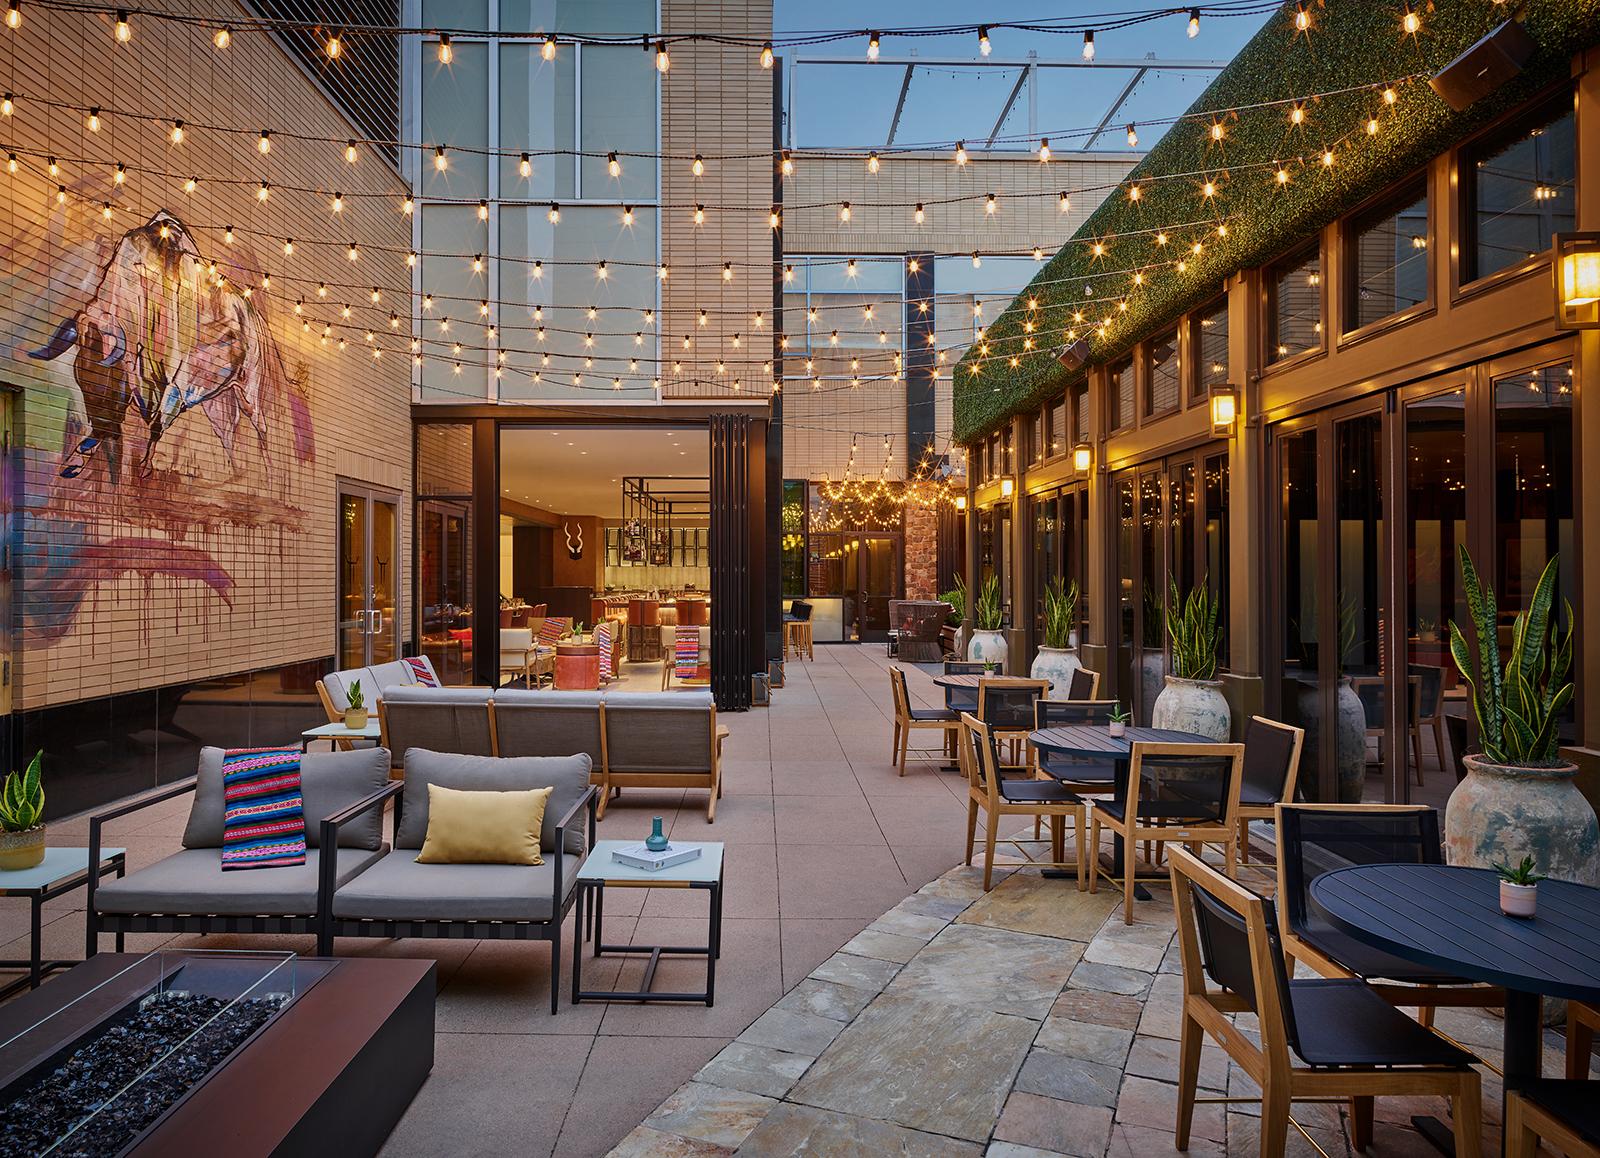 Richard Sandoval's Toro Latin Kitchen & Lounge Opens in Cherry Creek